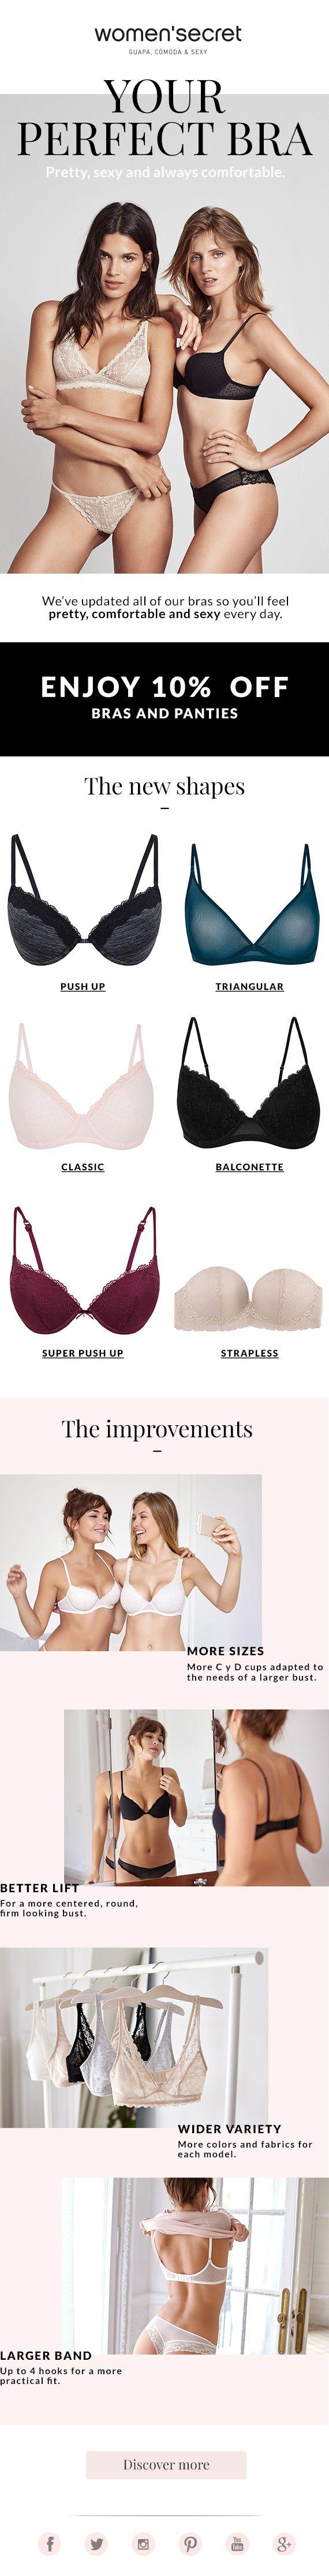 your perfect bra. women'secret newsletter.